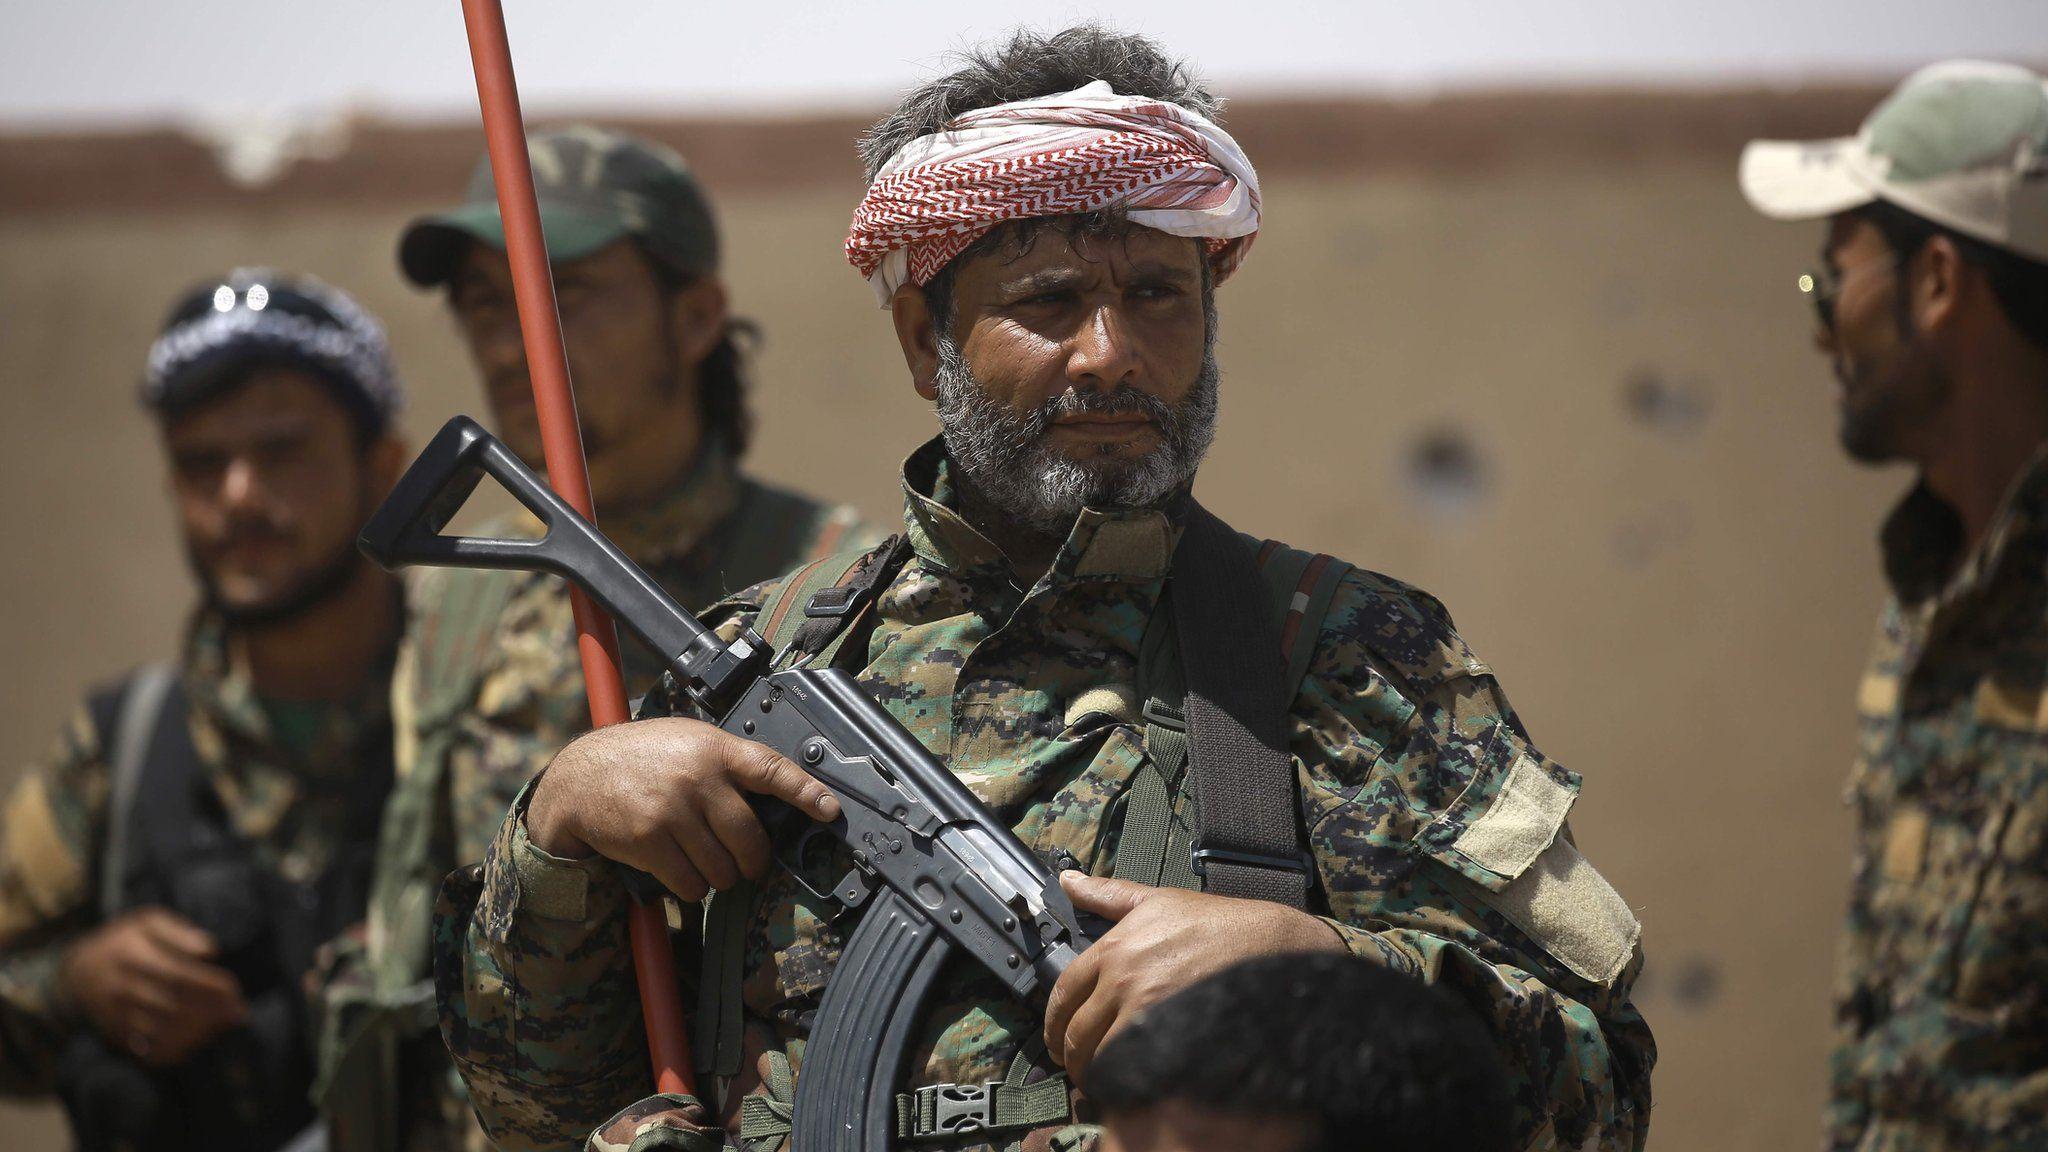 A man wearing a military uniform